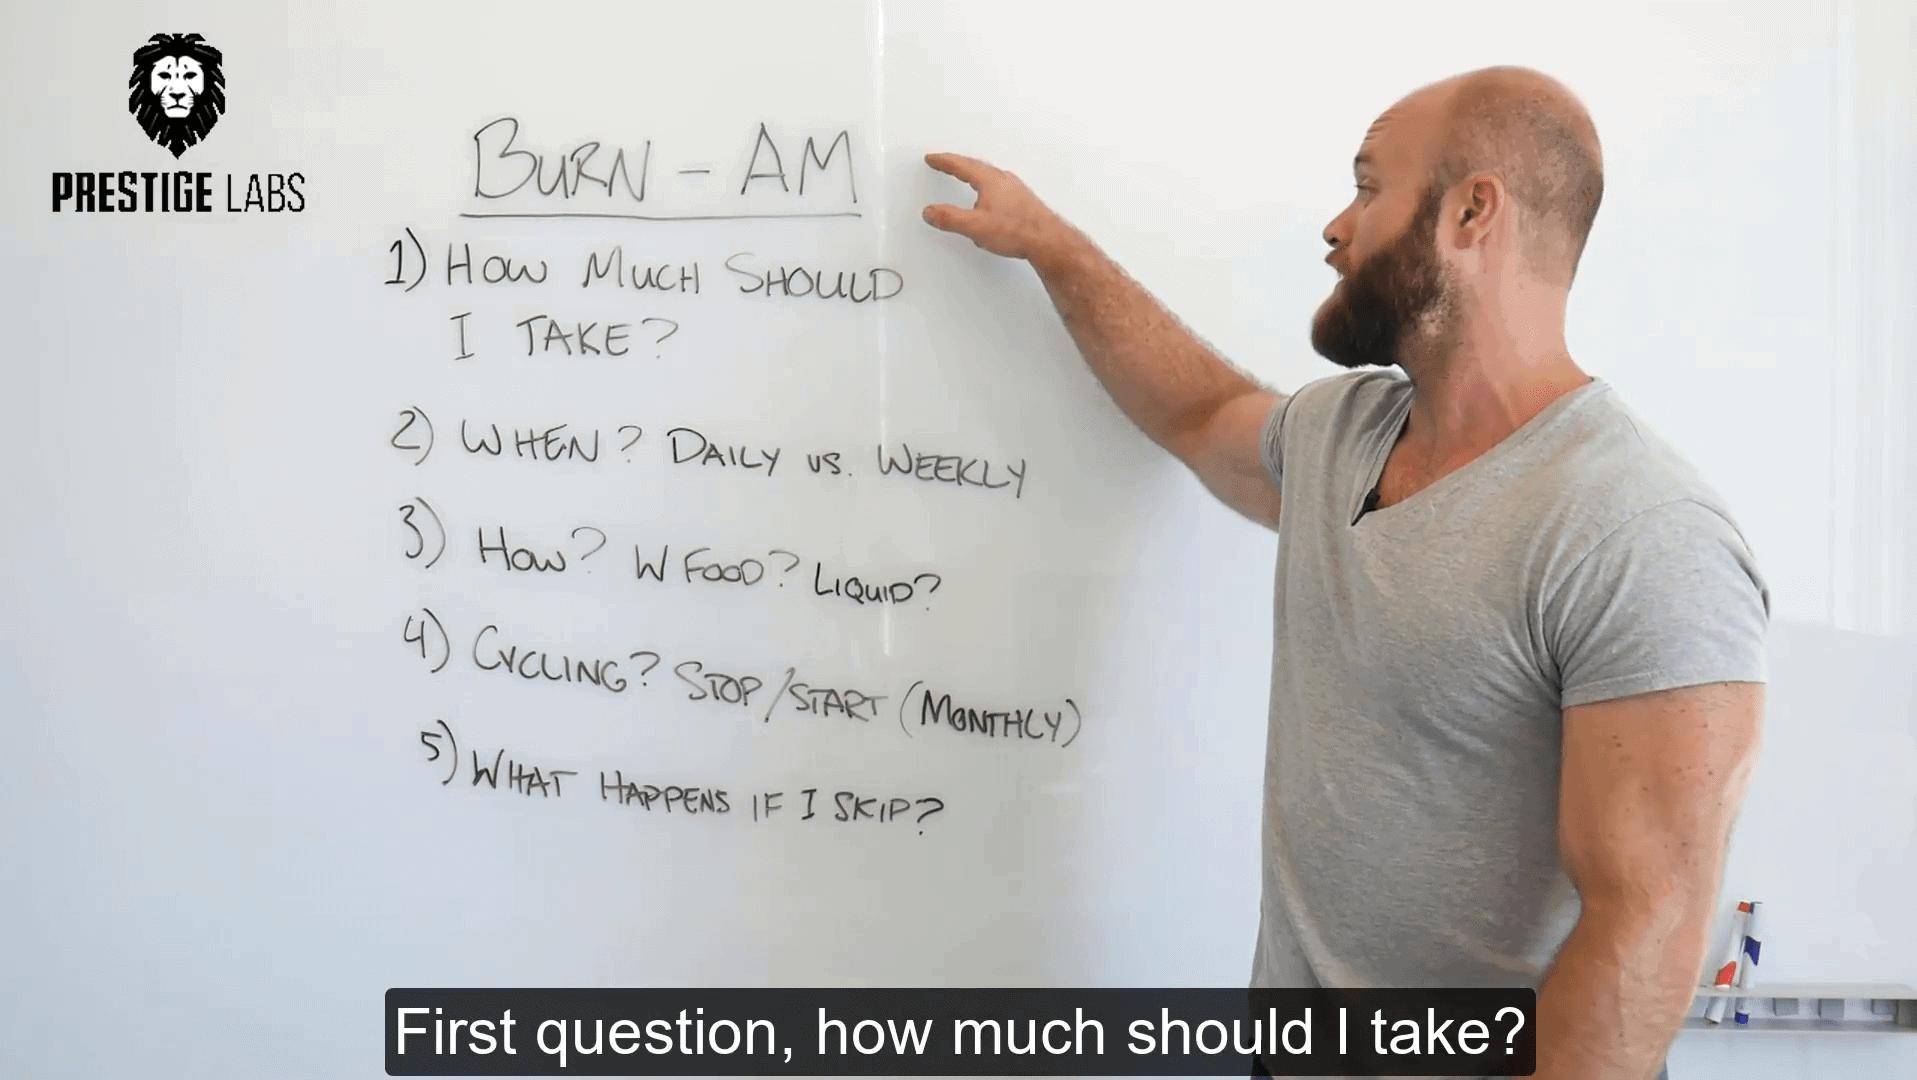 BURN AM - How to Take: